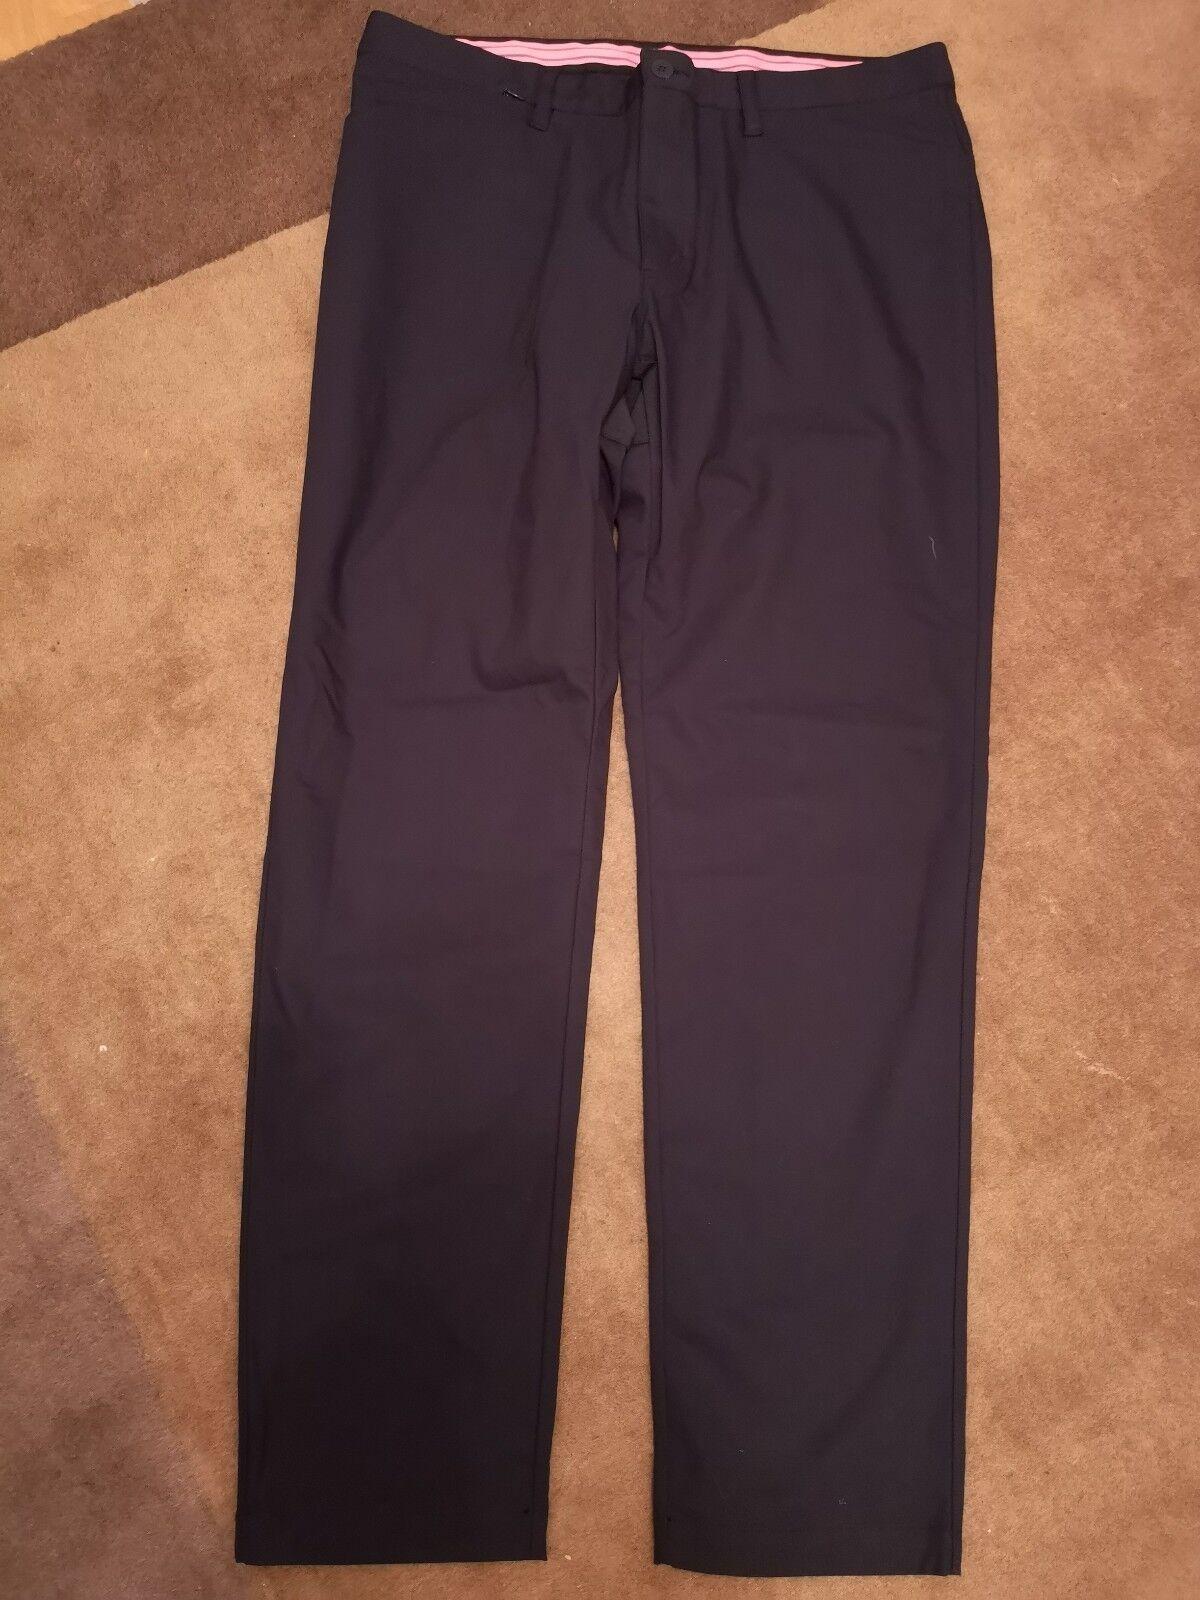 NEUF avec étiquettes bleu marine Rapha Hiver Pantalon 40x32